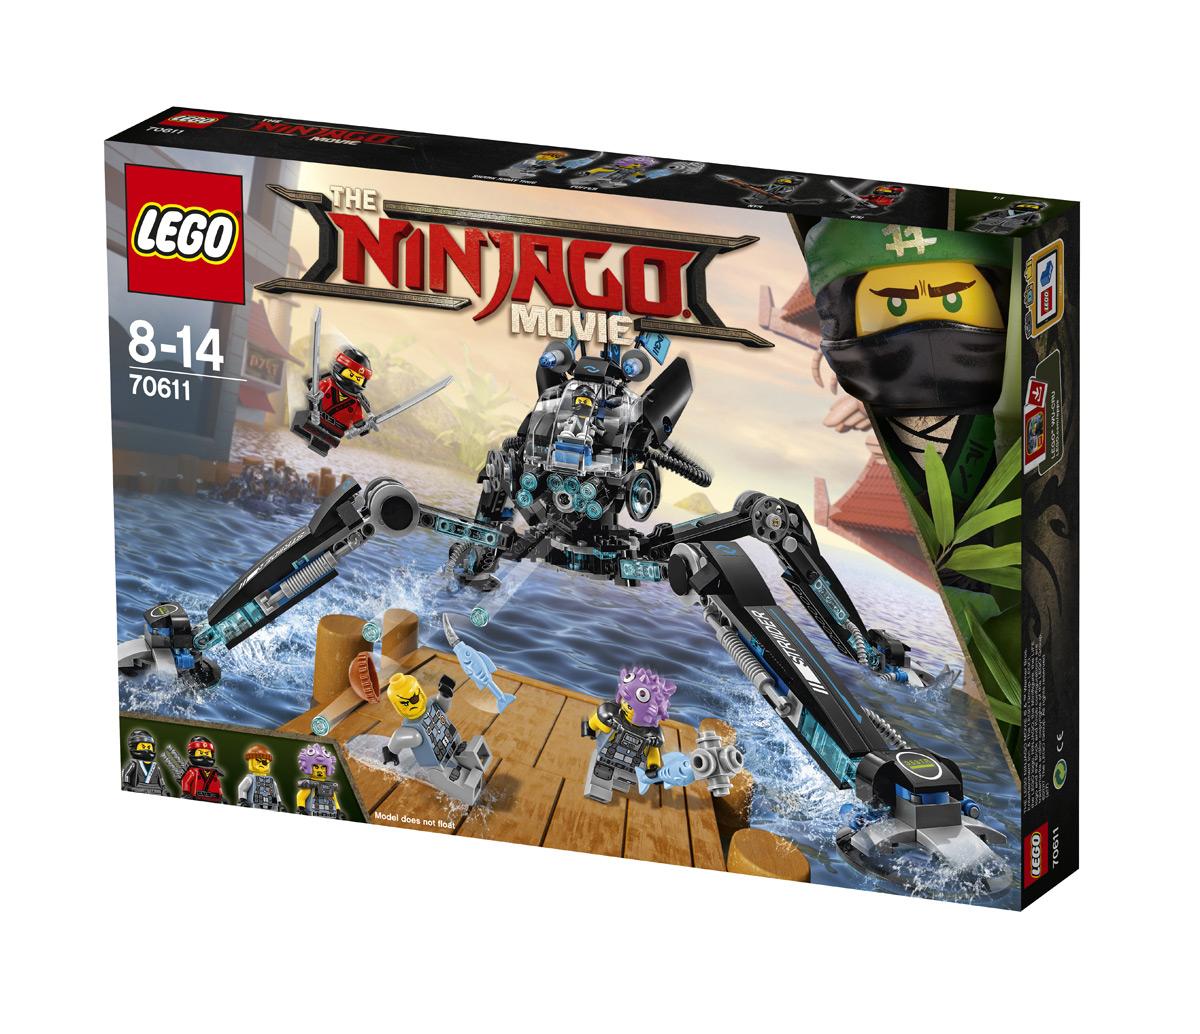 Vyhrajte LEGO Ninjago Vodní chodec — velká stavebnice inspirovaná filmem - www.designportal.cz